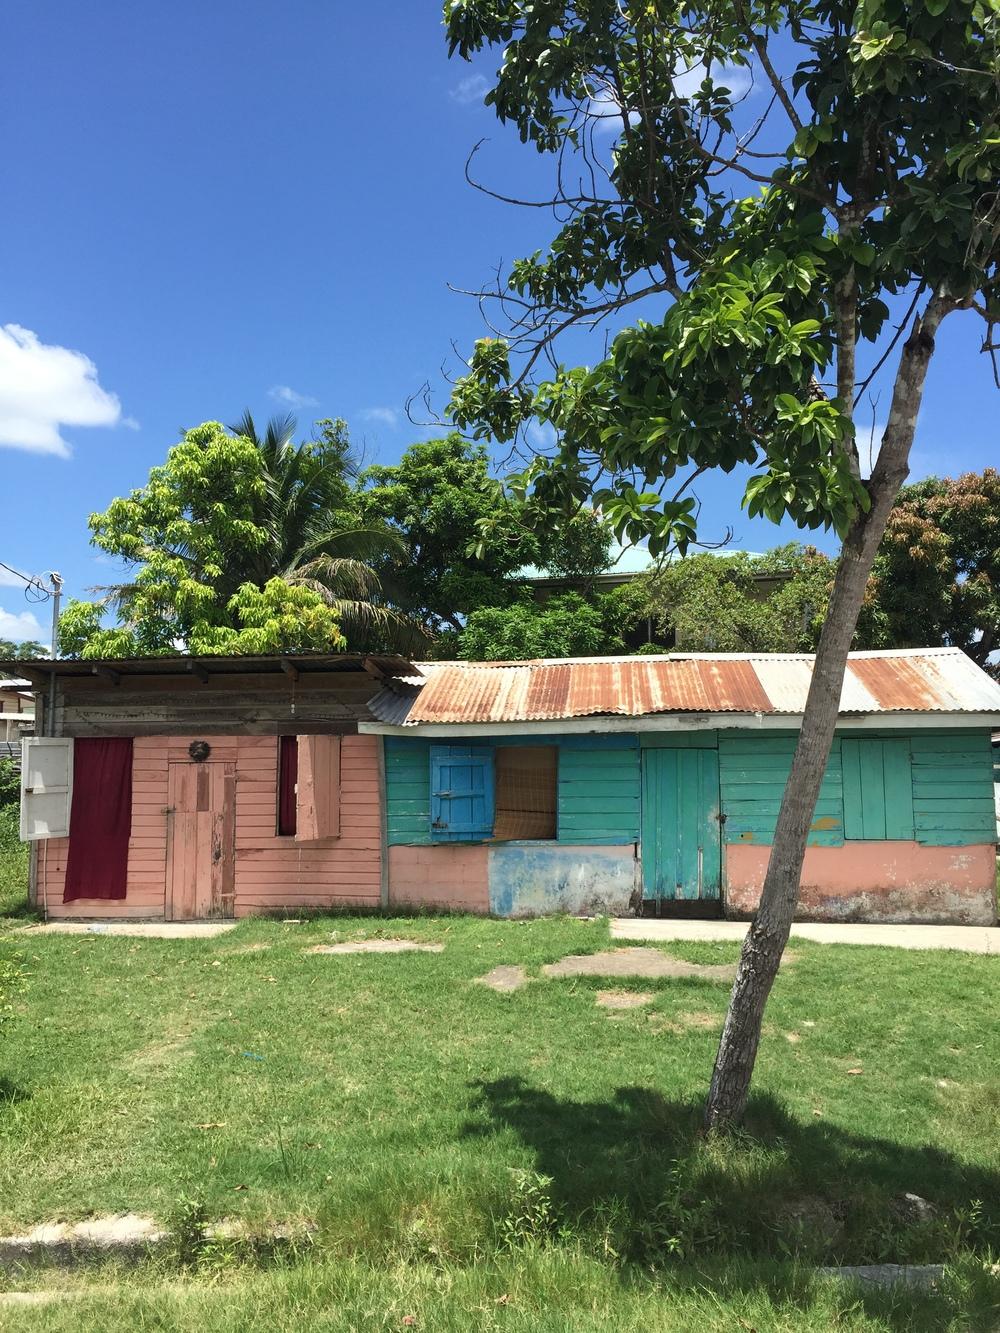 San Ignacio, Belize.